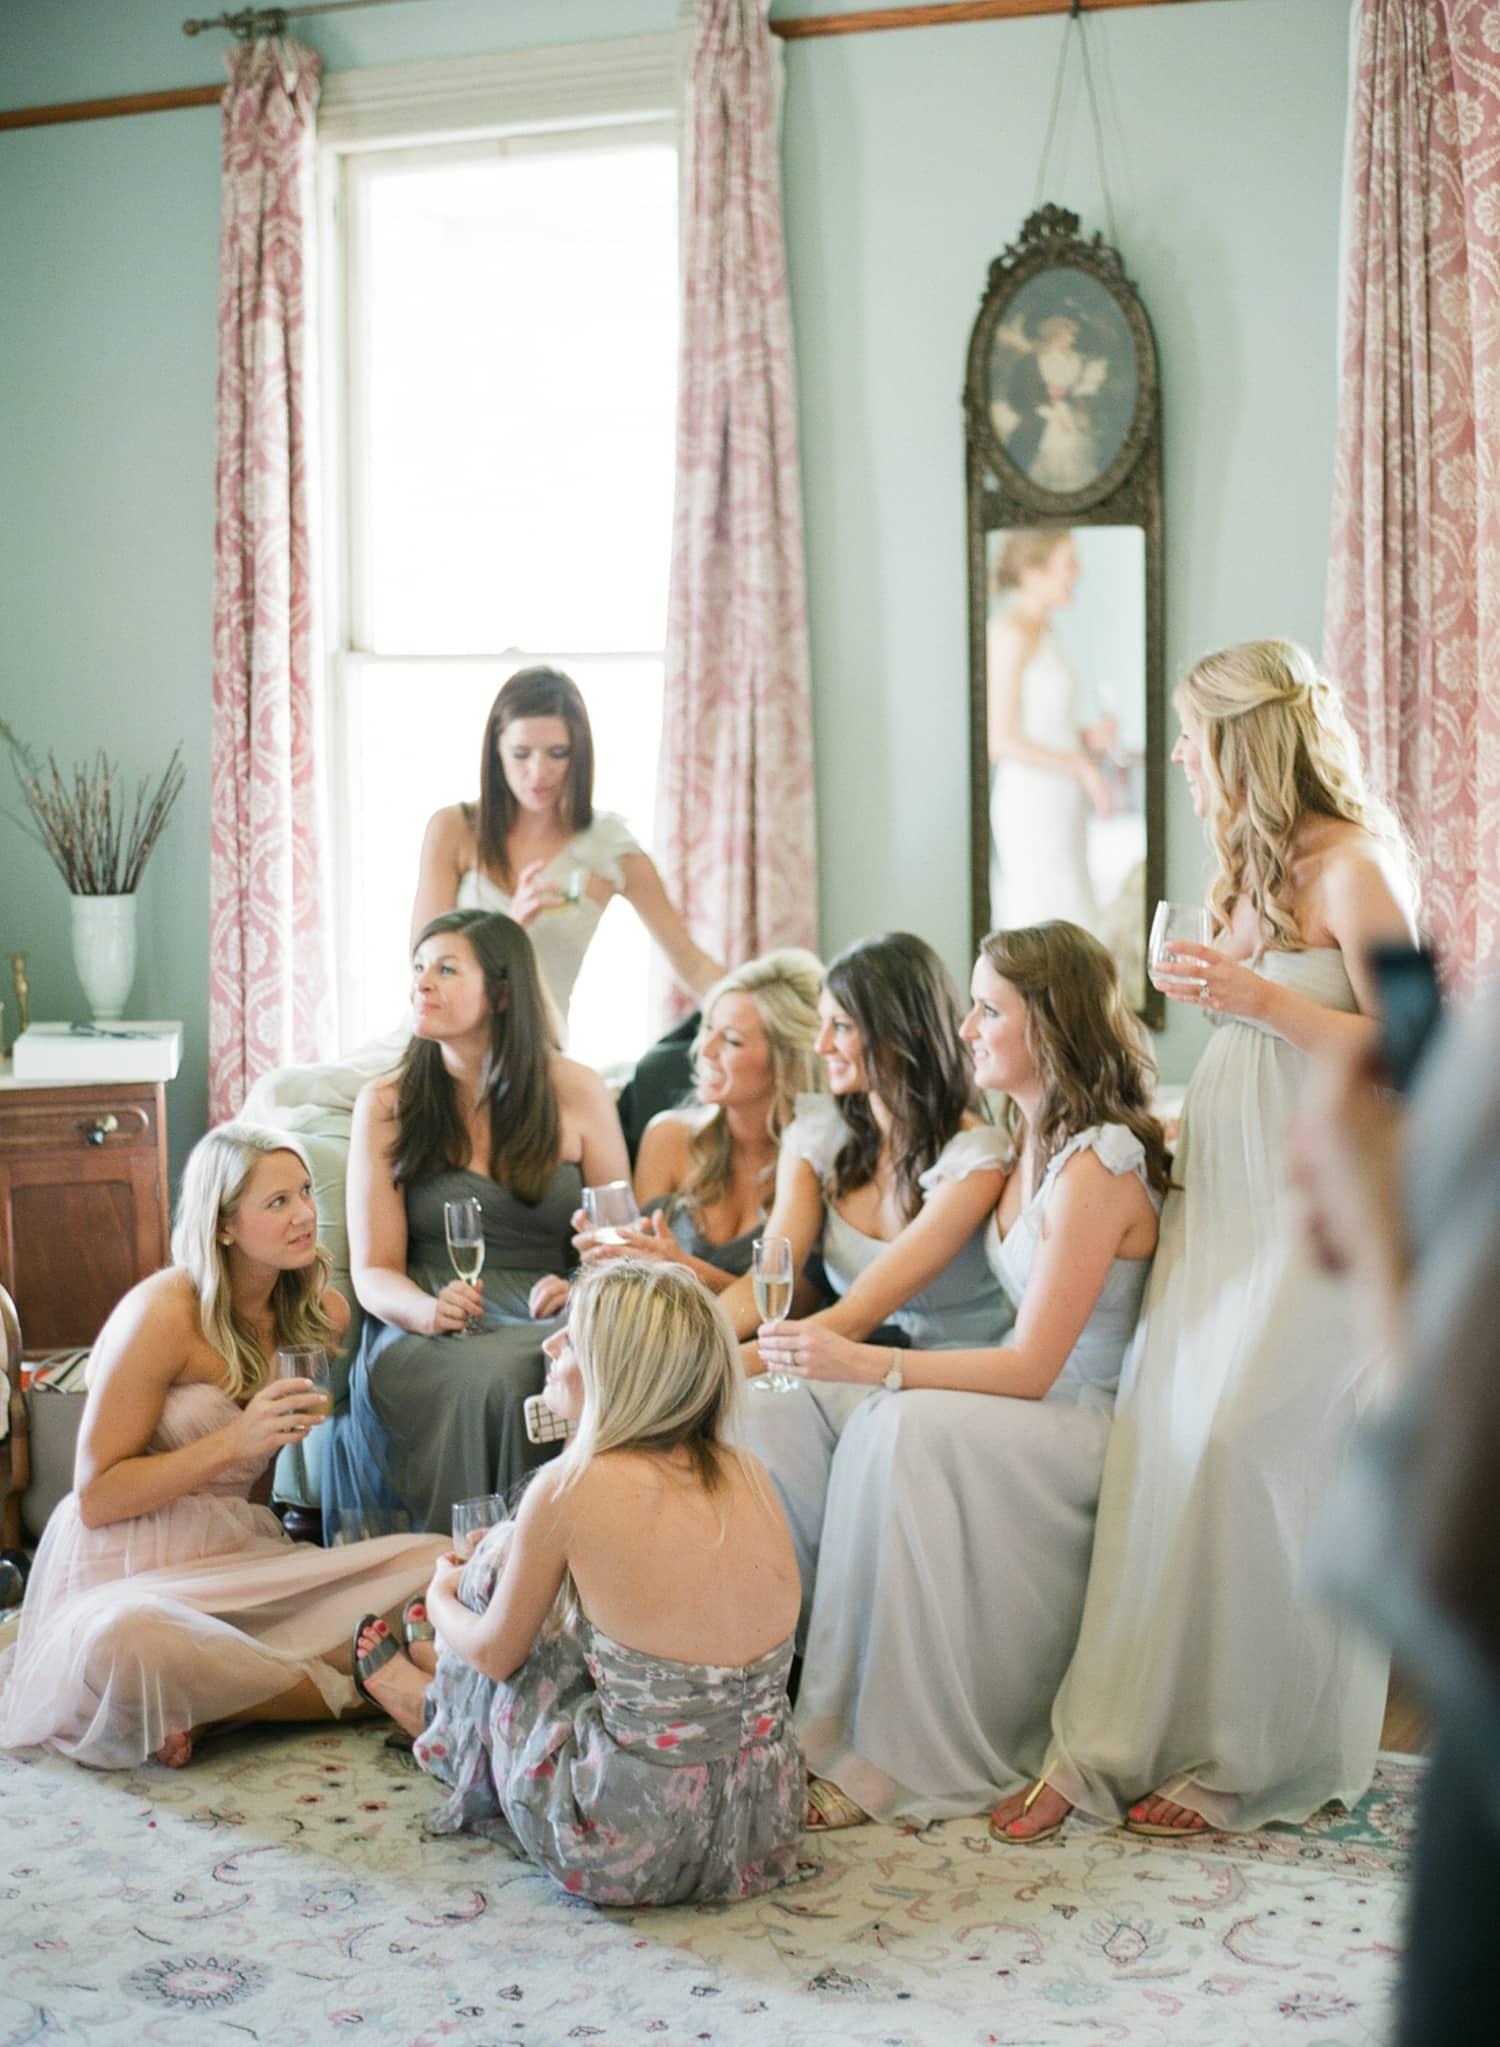 barr-mansion-wedding-4.jpg